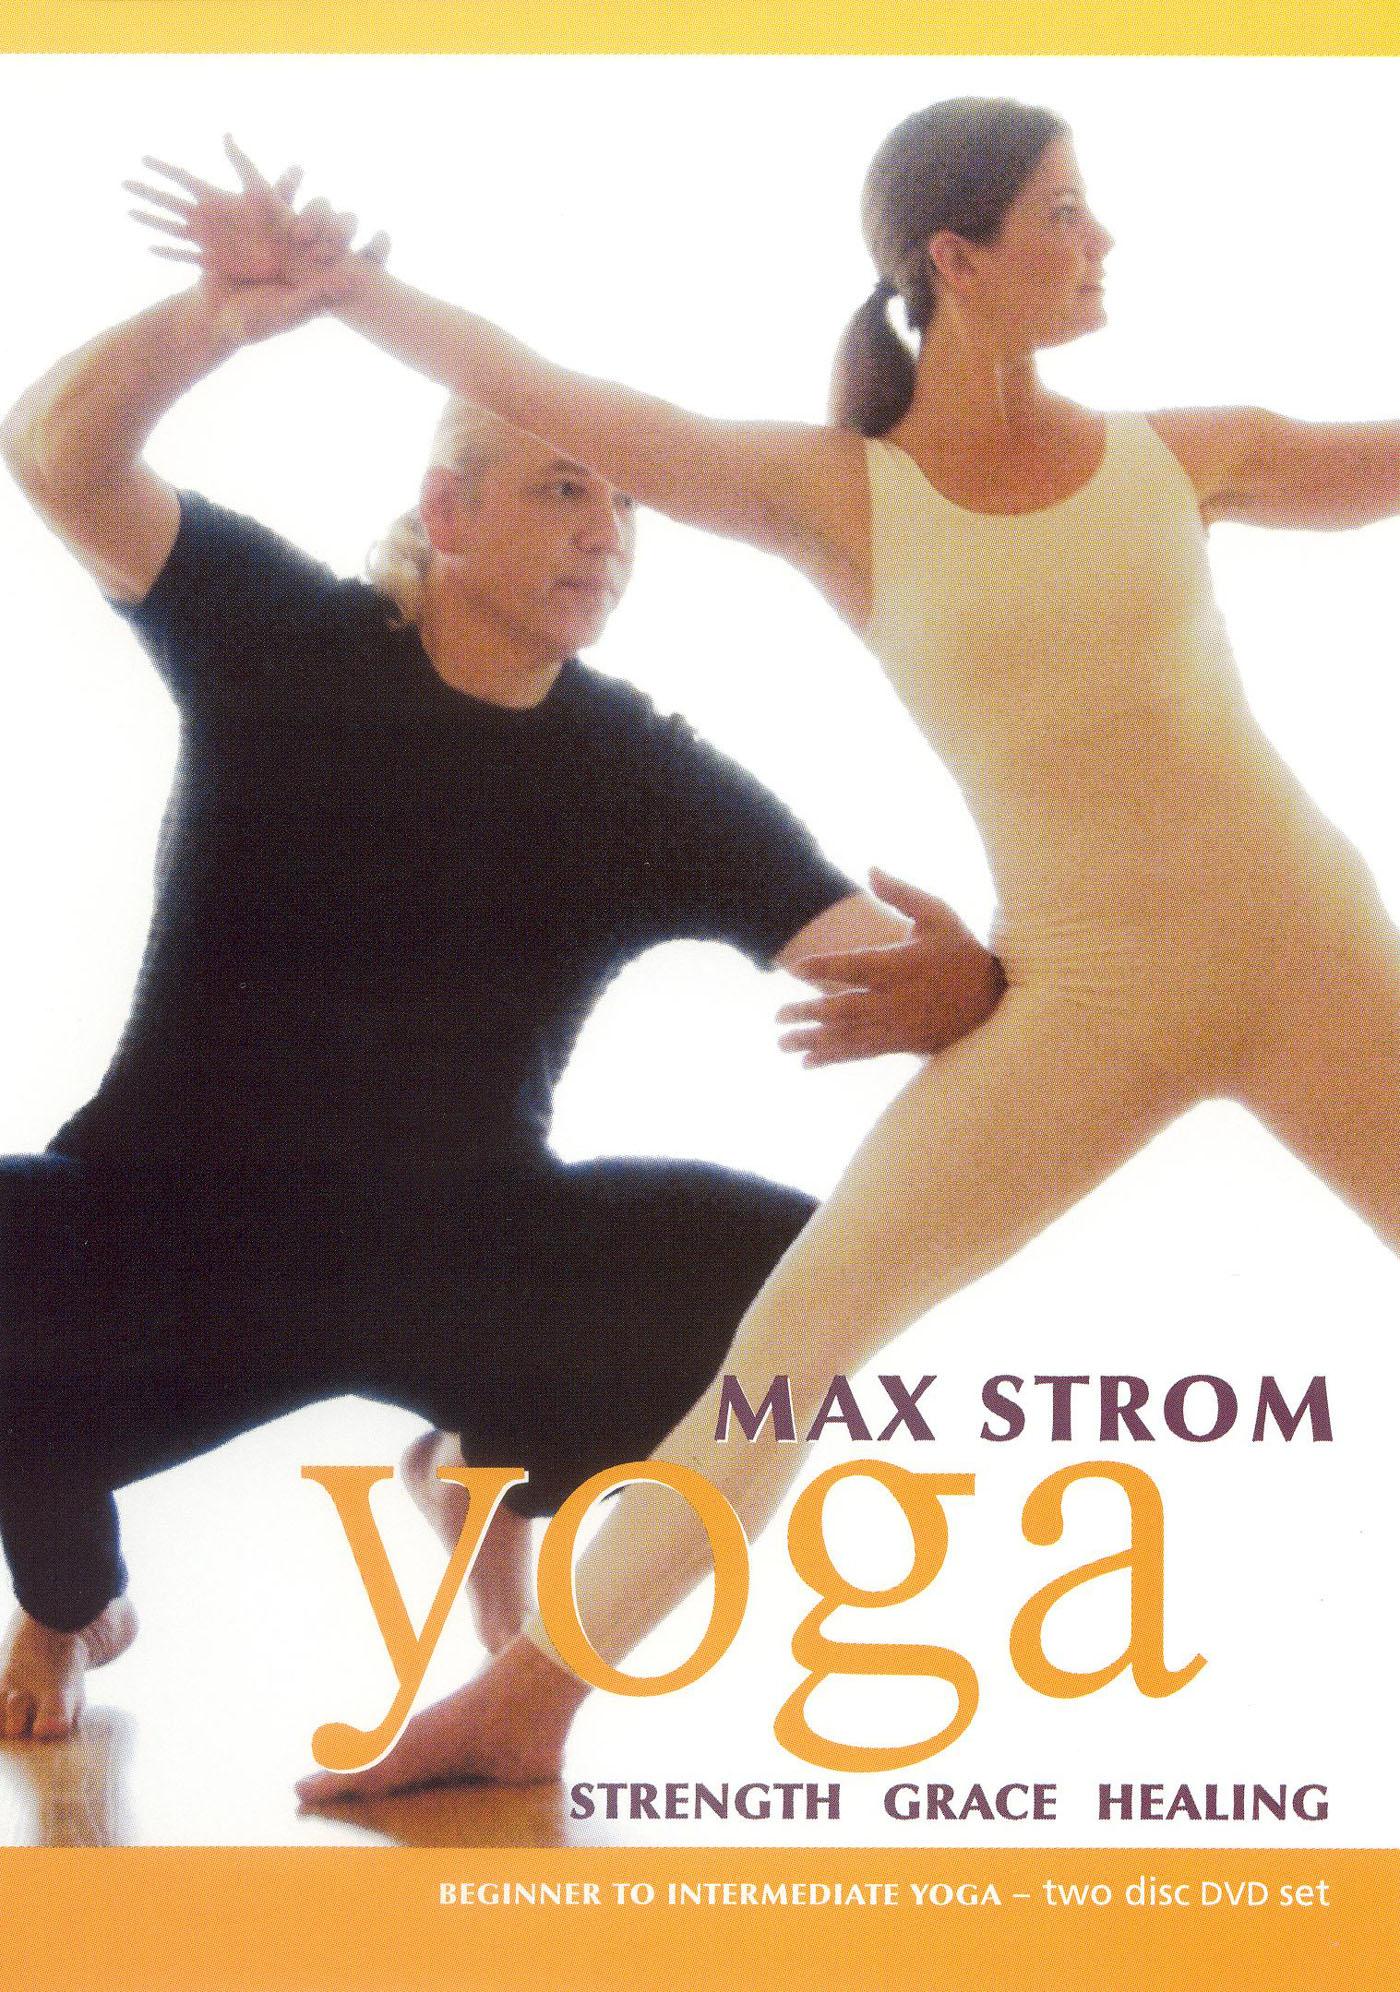 Max Strom: Strength, Grace, Healing